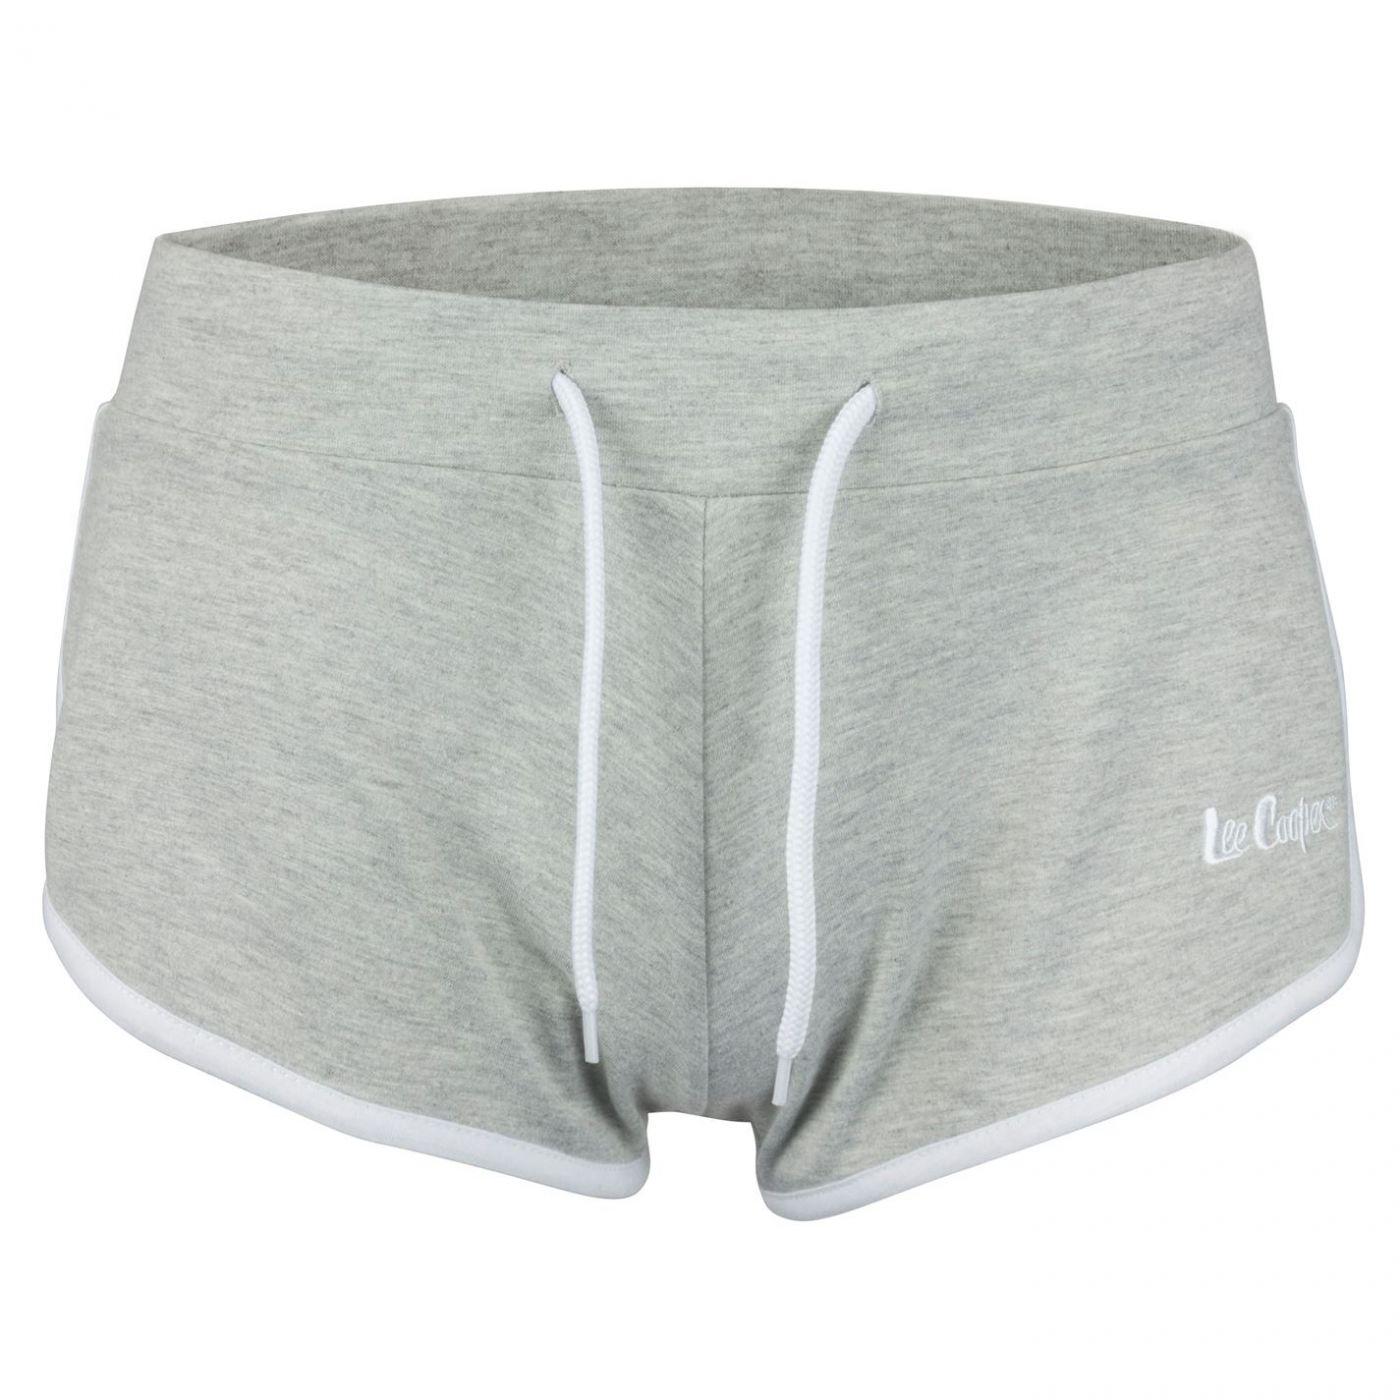 Lee Cooper Casual Shorts Ladies